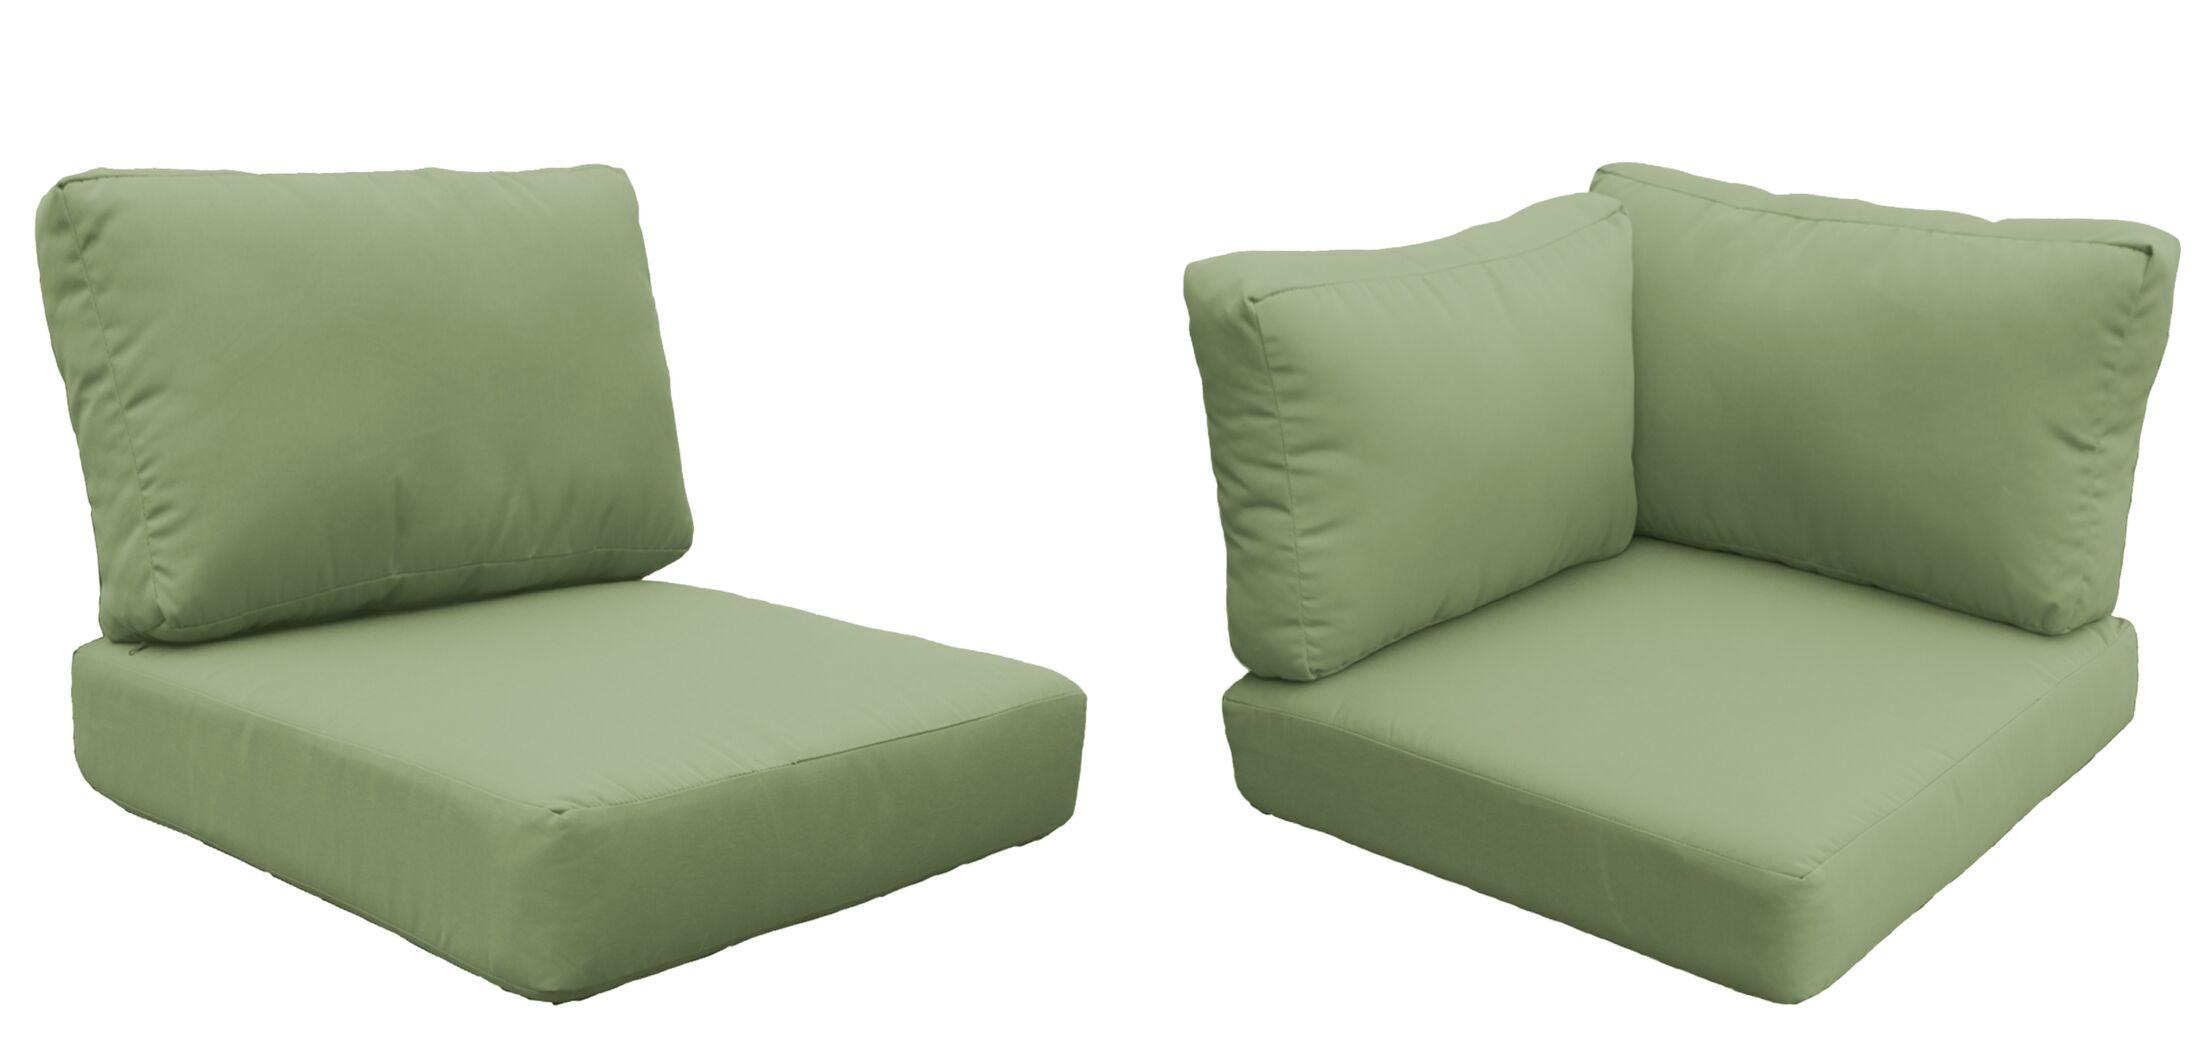 Florence 13 Piece Outdoor Cushion Set Fabric: Cilantro